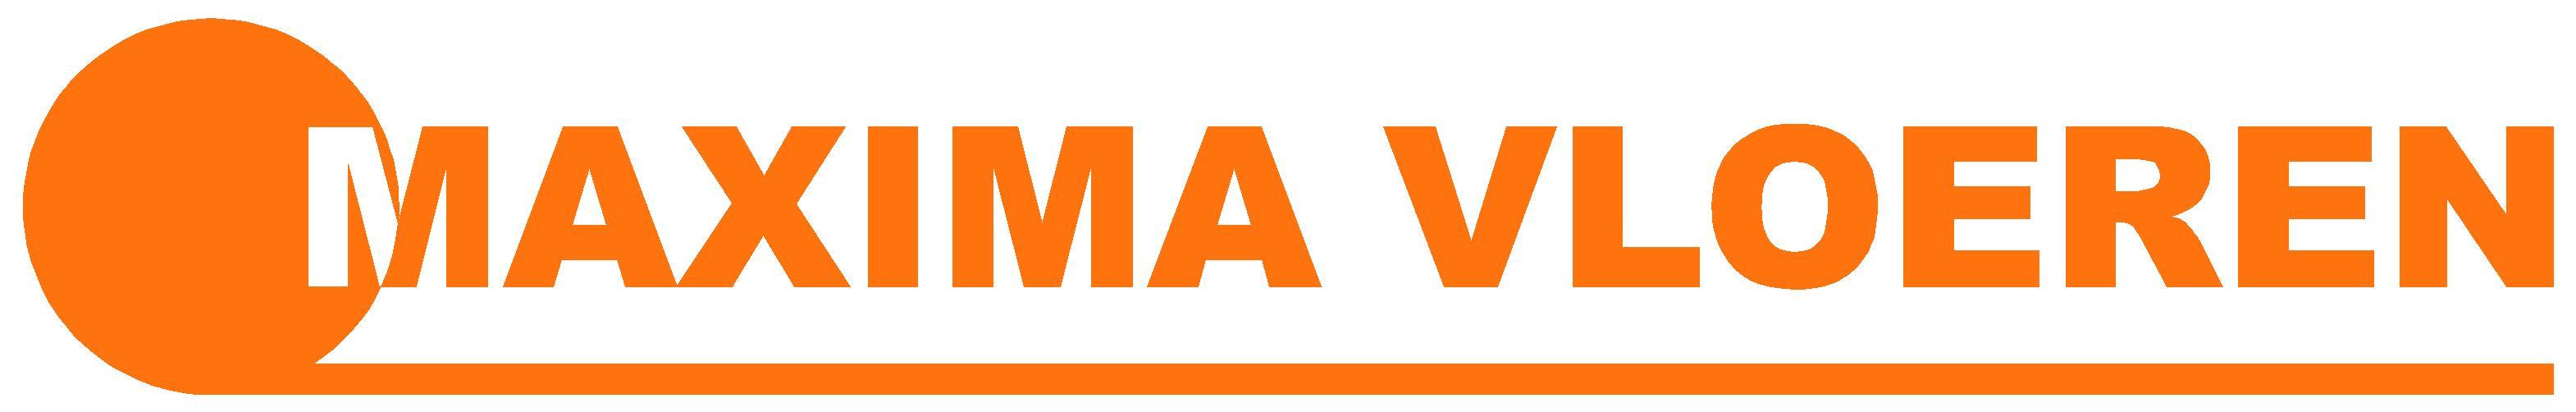 Maxima Vloeren Wierden Logo